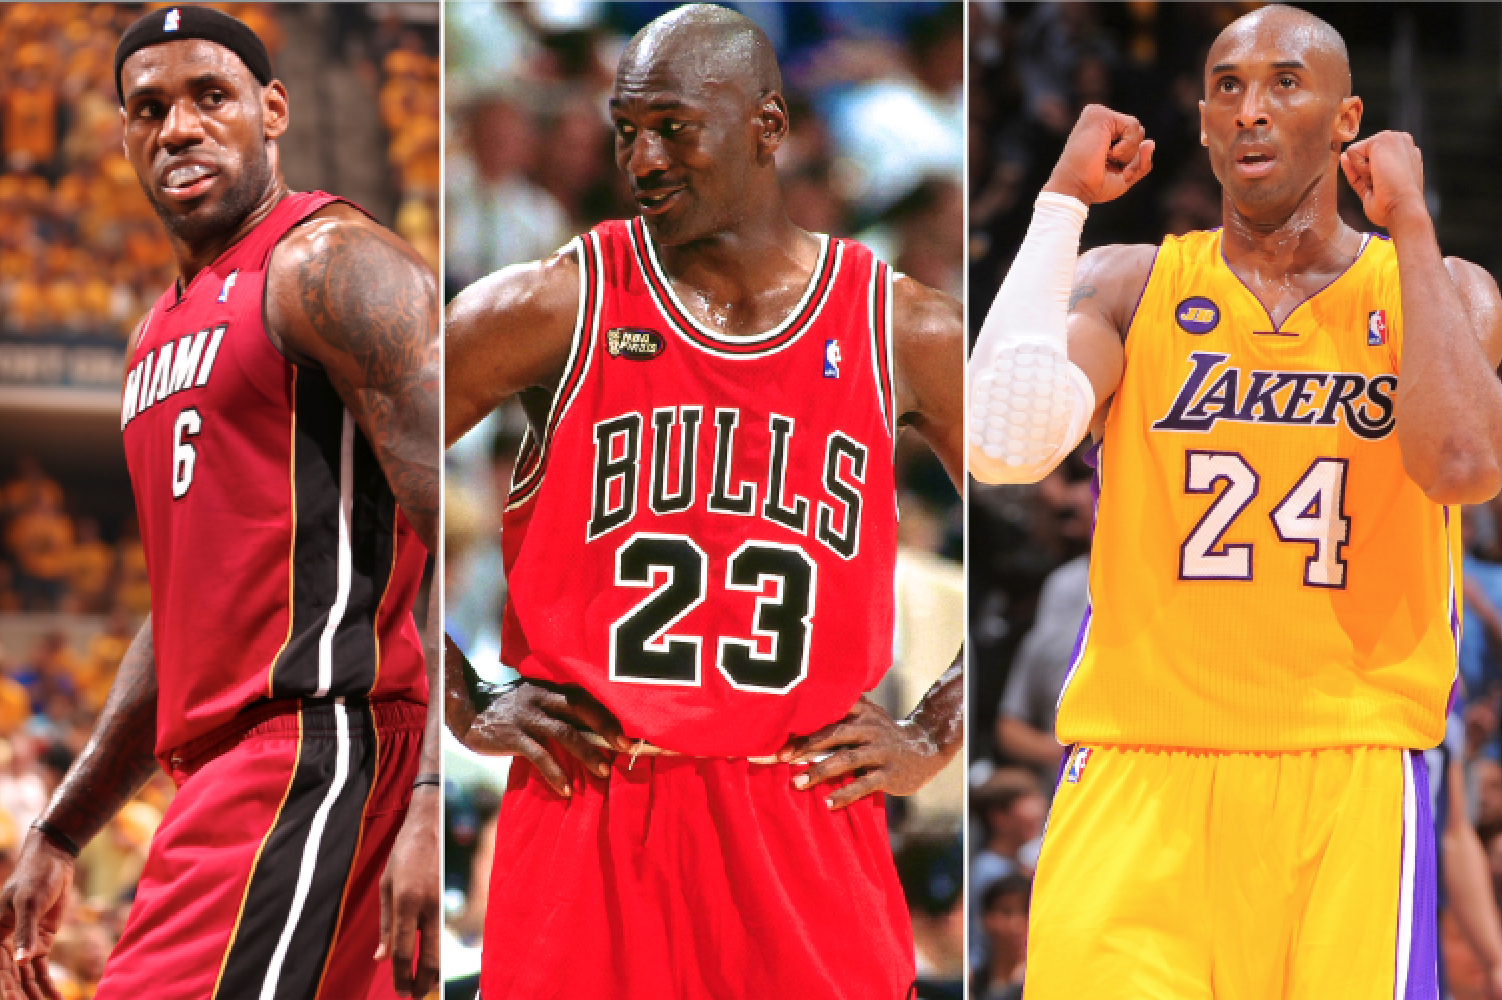 Lbj Vs Kobe Vs Jordan Who S The All Time King Of Game 7s Bleacher Report Latest News Videos And Highlights